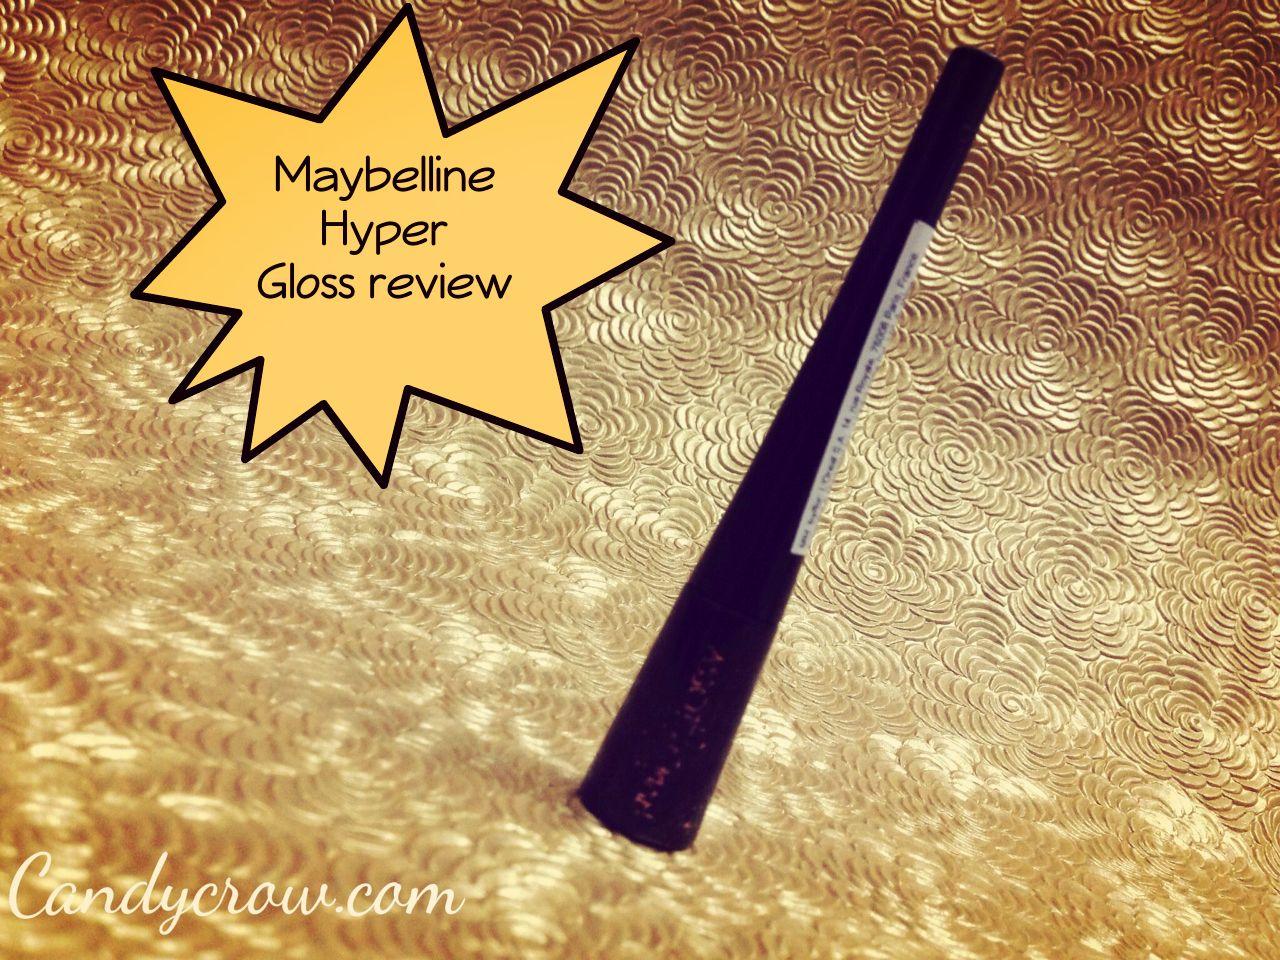 Maybelline Hyper Glossy Liquid Eyeliner - Black Review